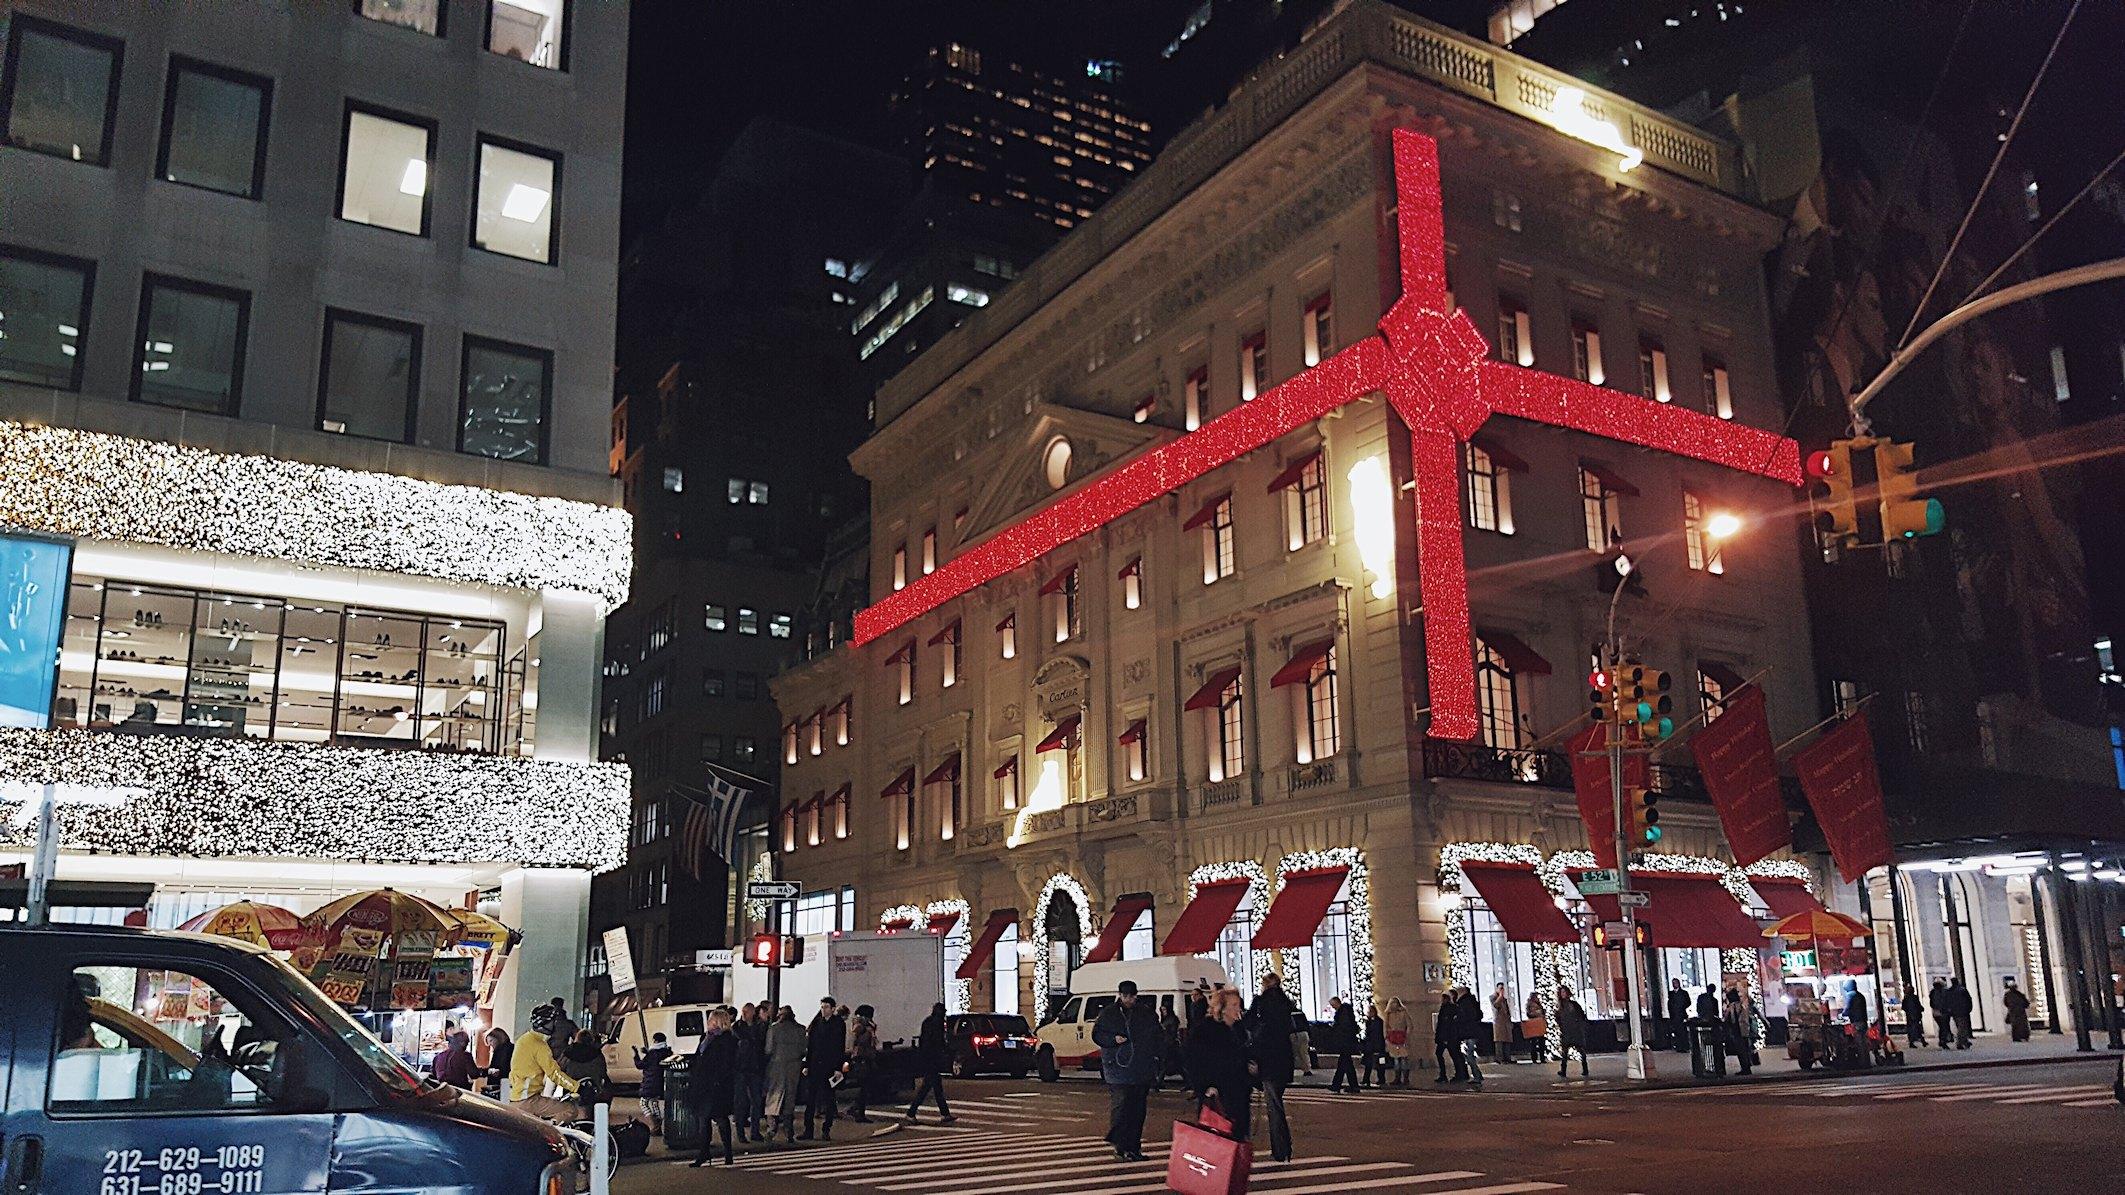 USA, Nowy Jork, Piąta Aleja, 5th Avenue